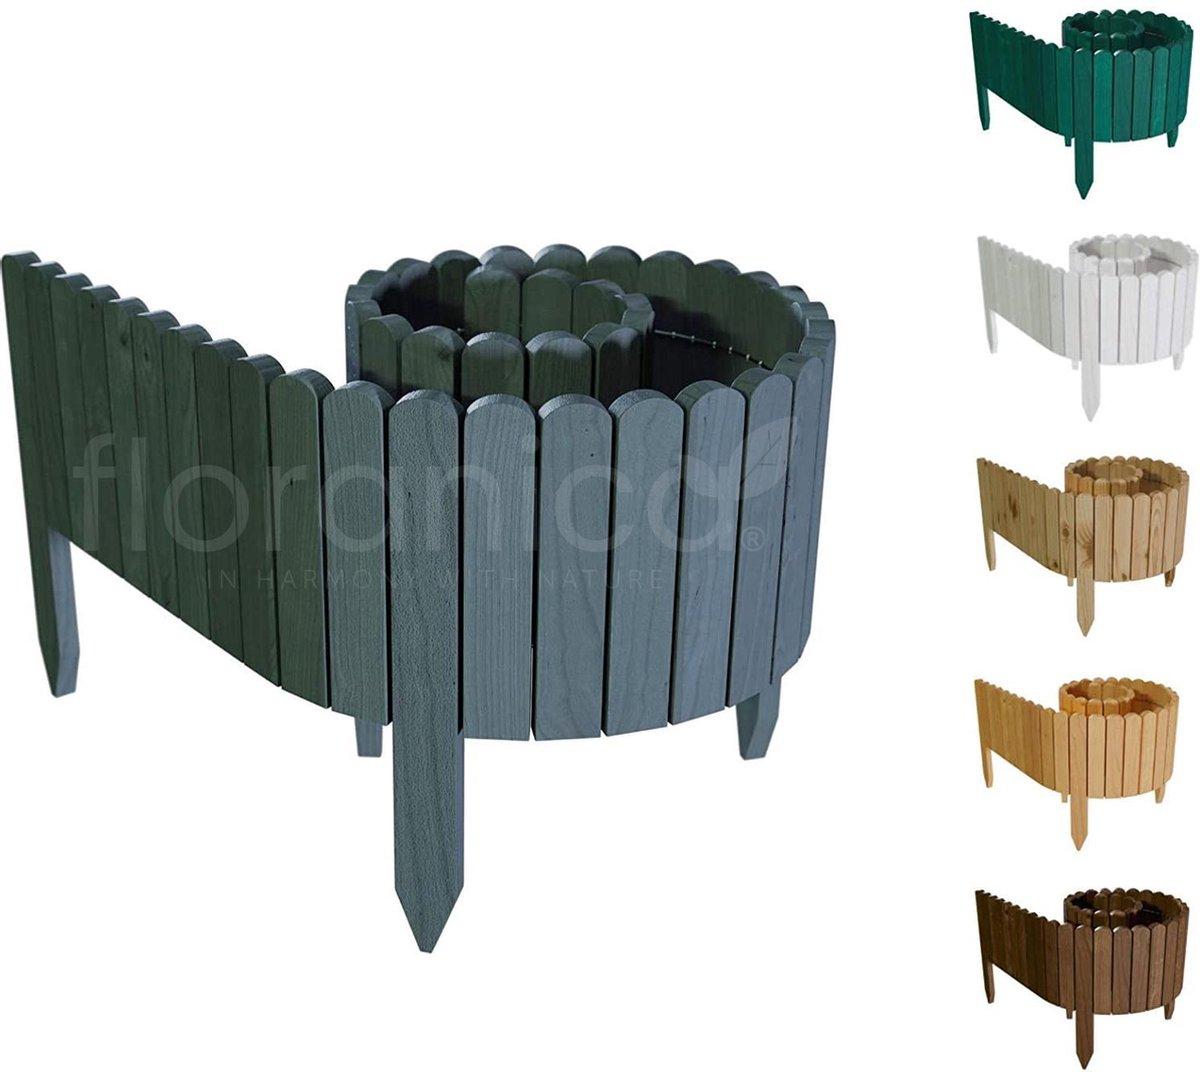 Floranica® Rollborder - 203x10cm - Hout - Antraciet